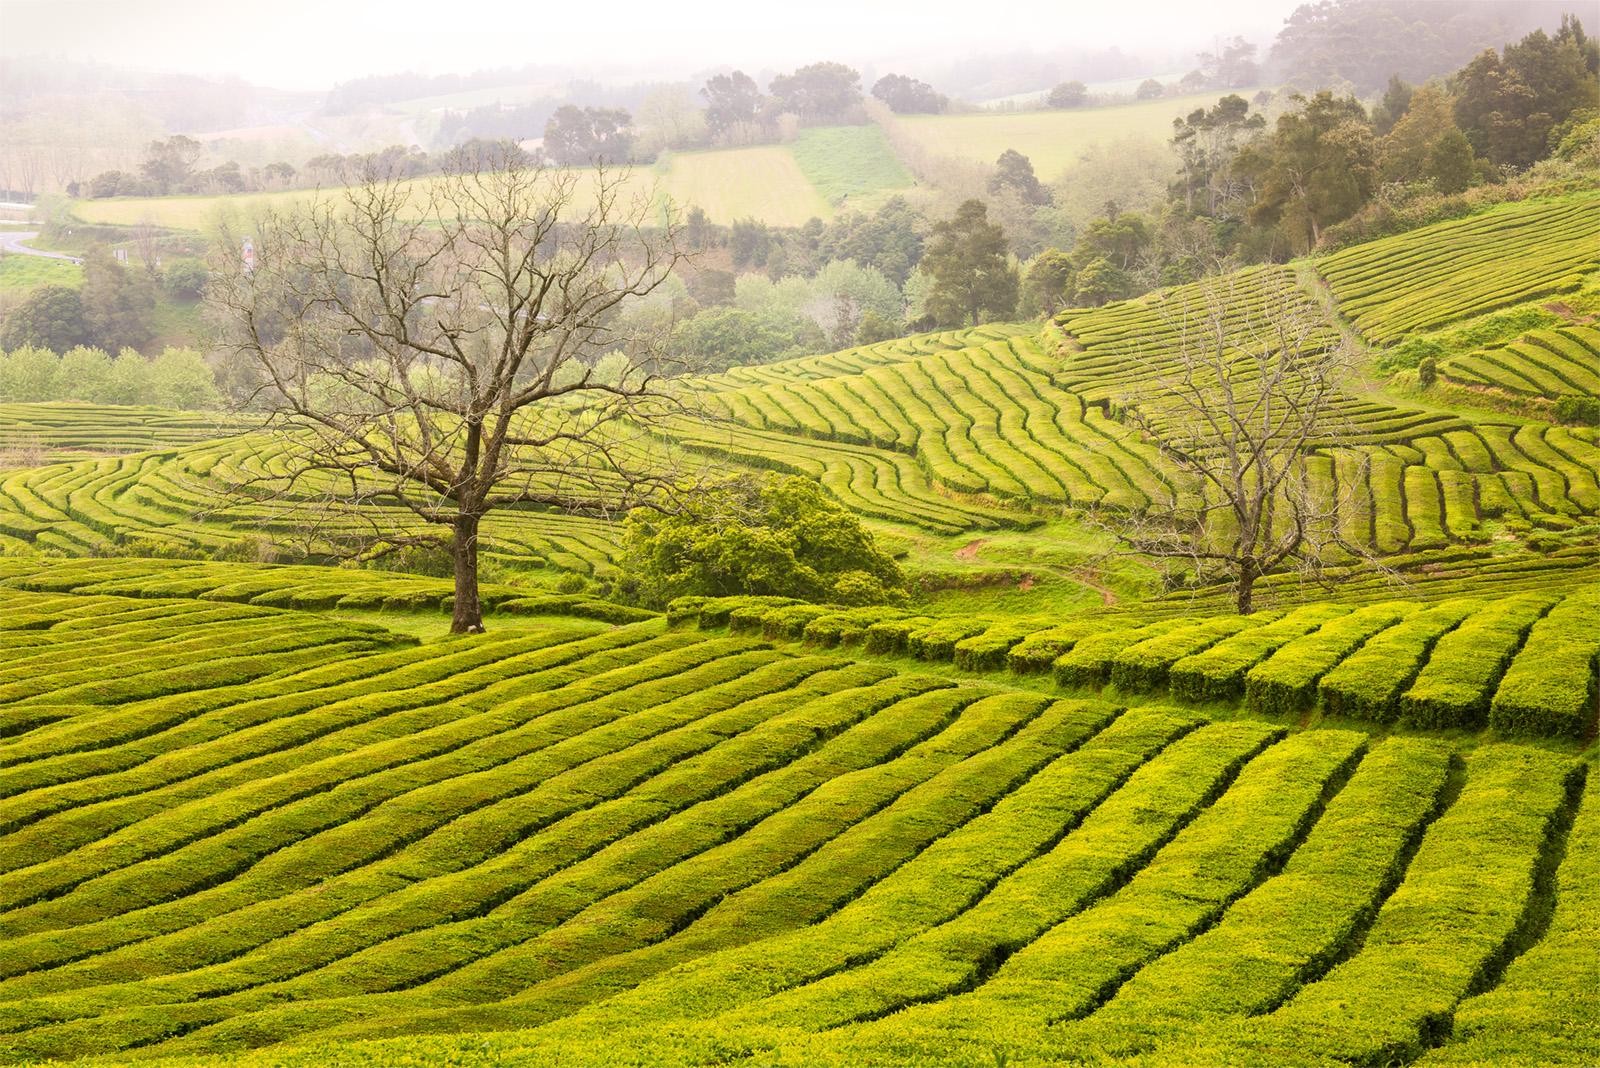 Gorreana Tea Plantation shrouded in fog